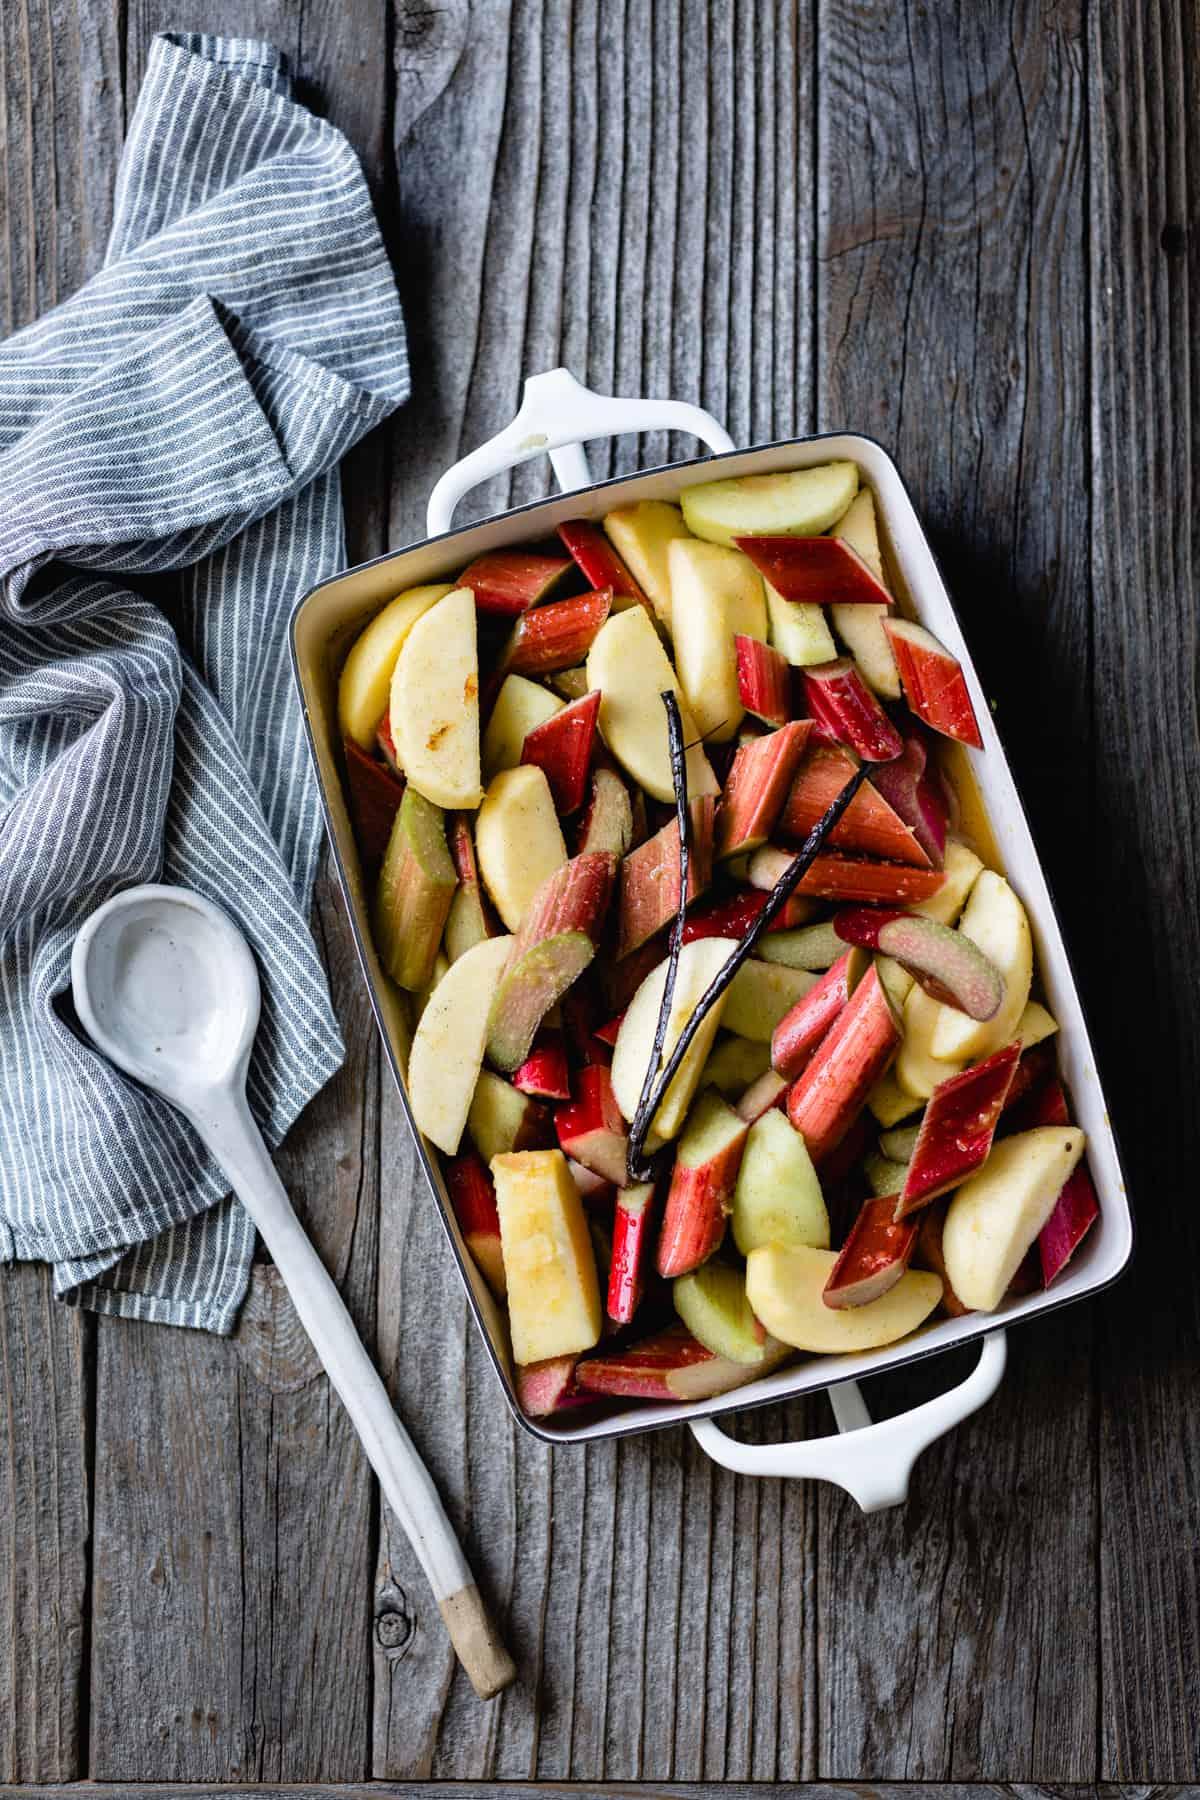 Gluten Free Apple Cobbler with Maple & Rhubarb